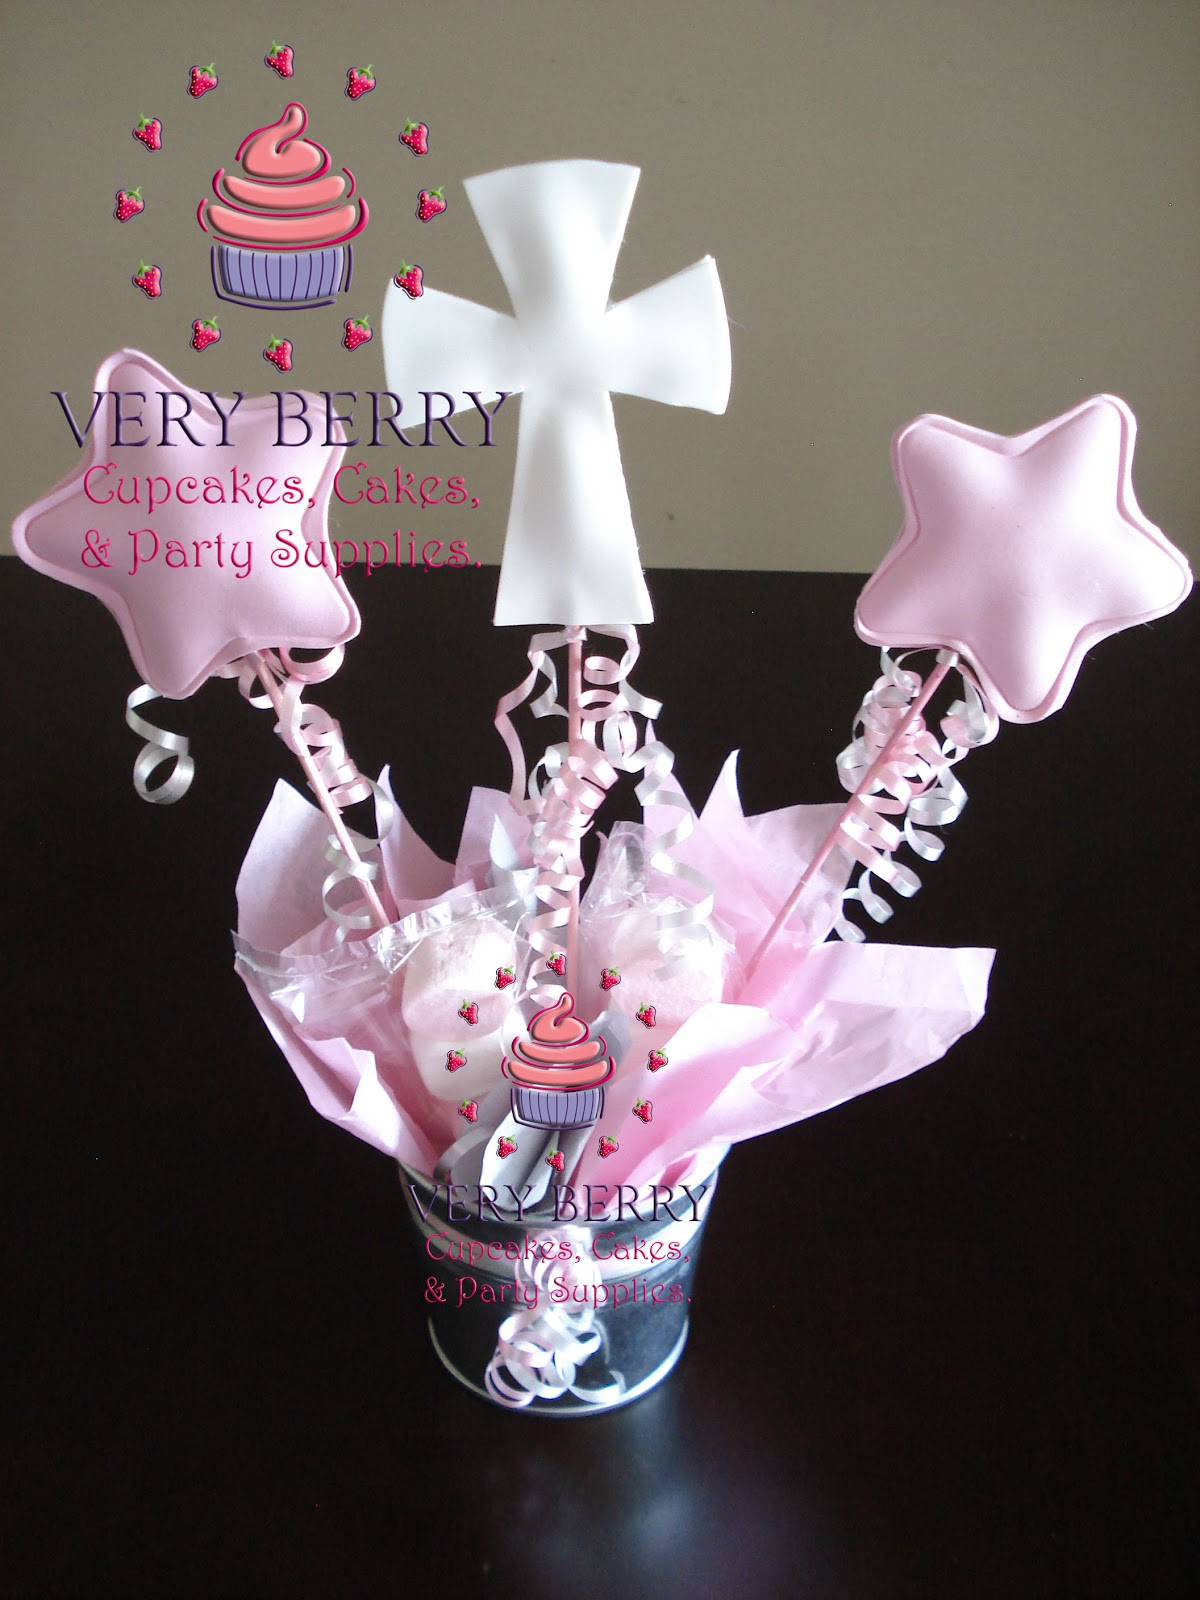 Christening centerpieces cake ideas and designs - Simple baptism centerpieces ...